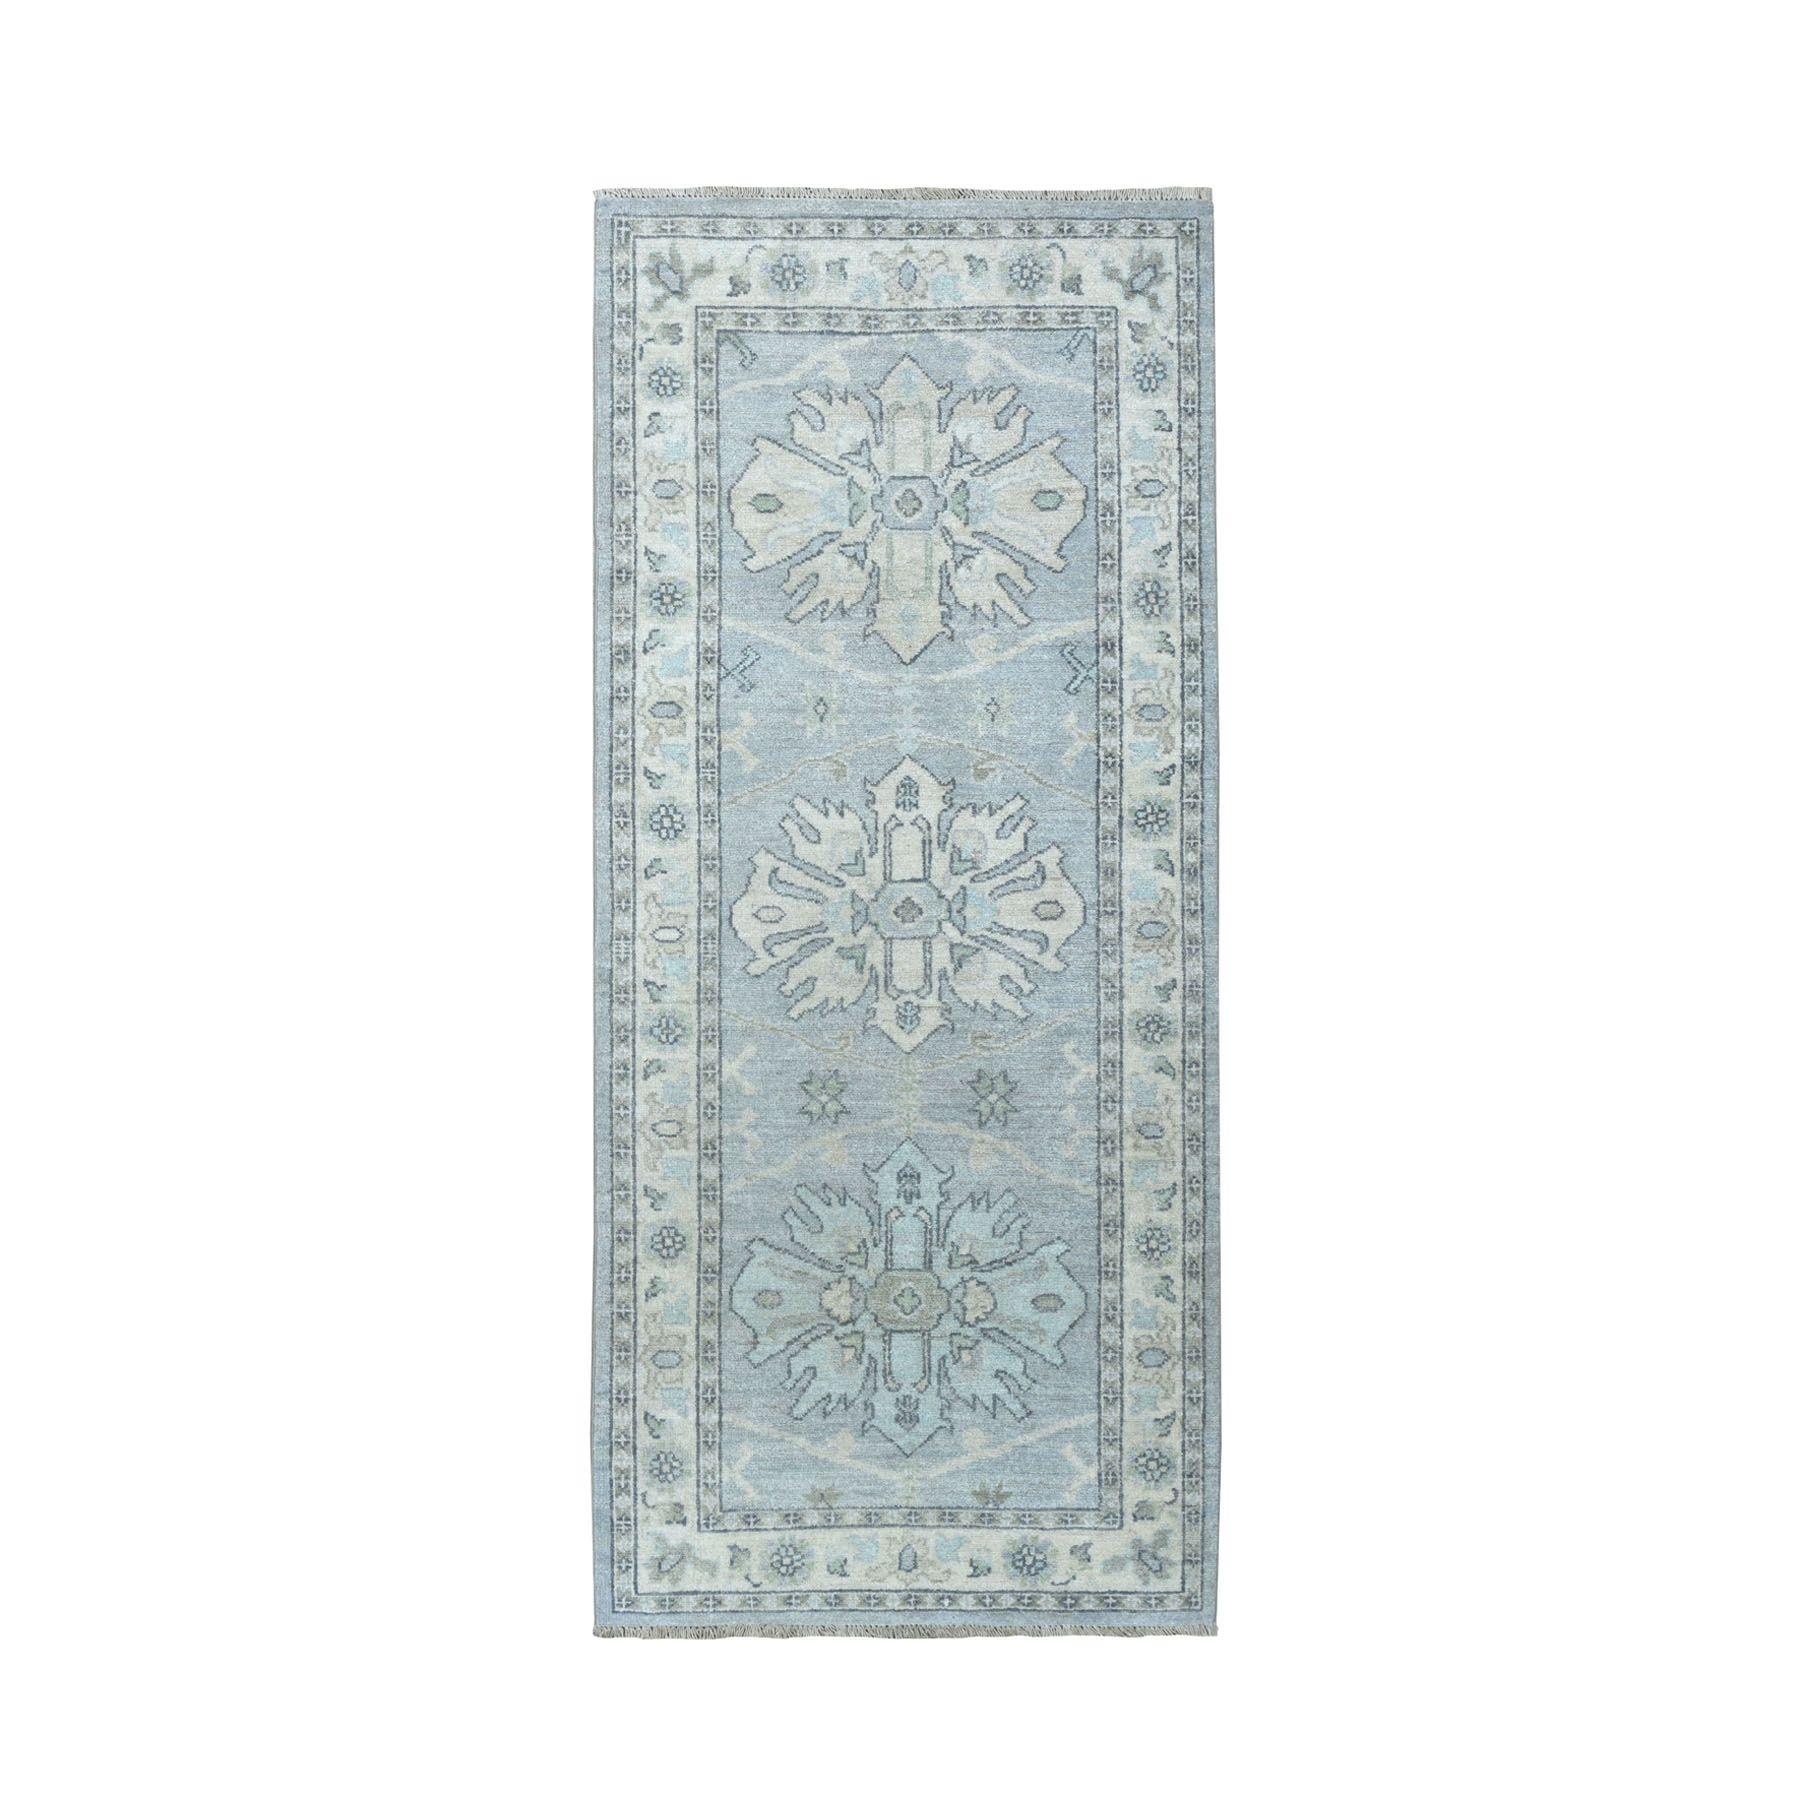 "2'7""X5'10""  White Wash Peshawar Pure Wool Hand Knotted Runner Oriental Rug moaeacde"